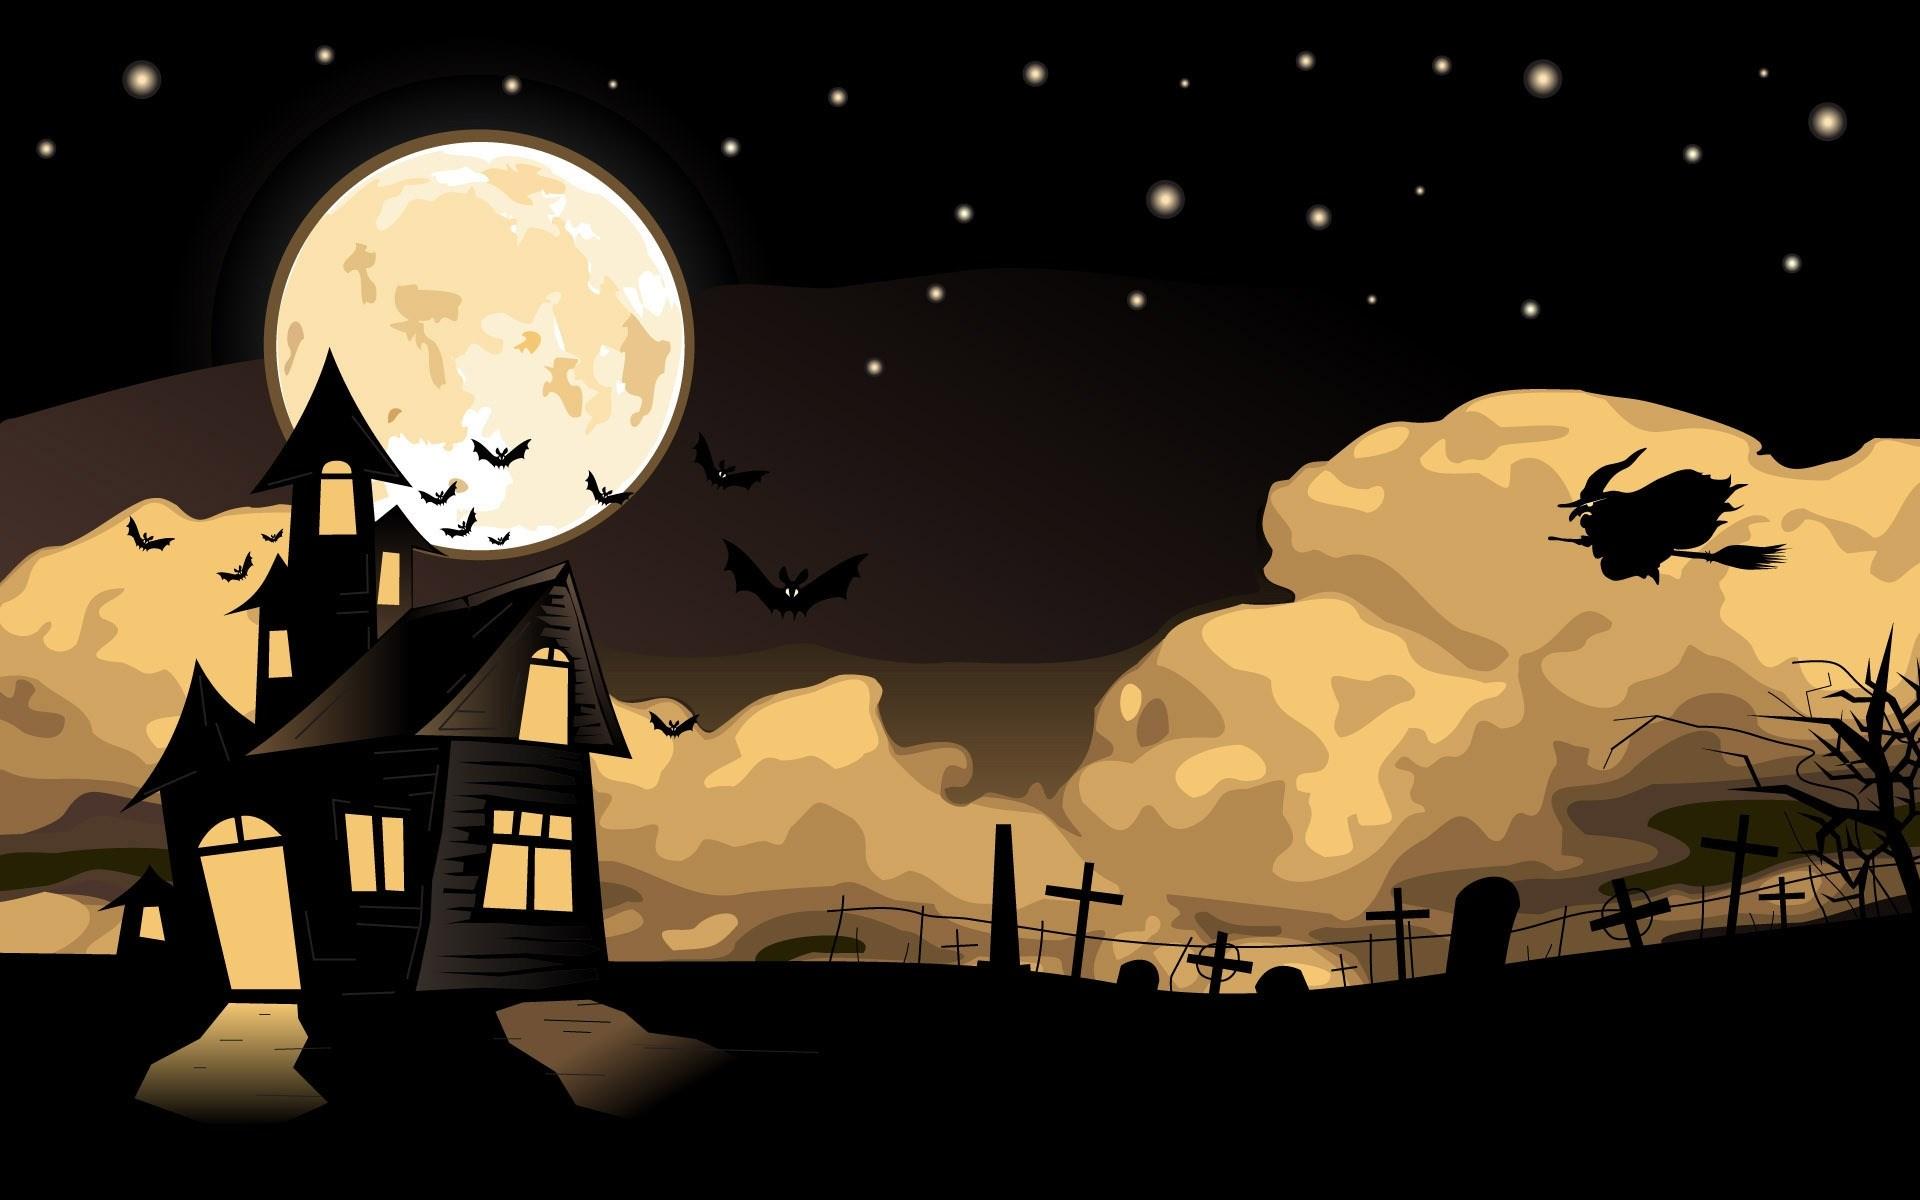 Halloween House Witch Bats